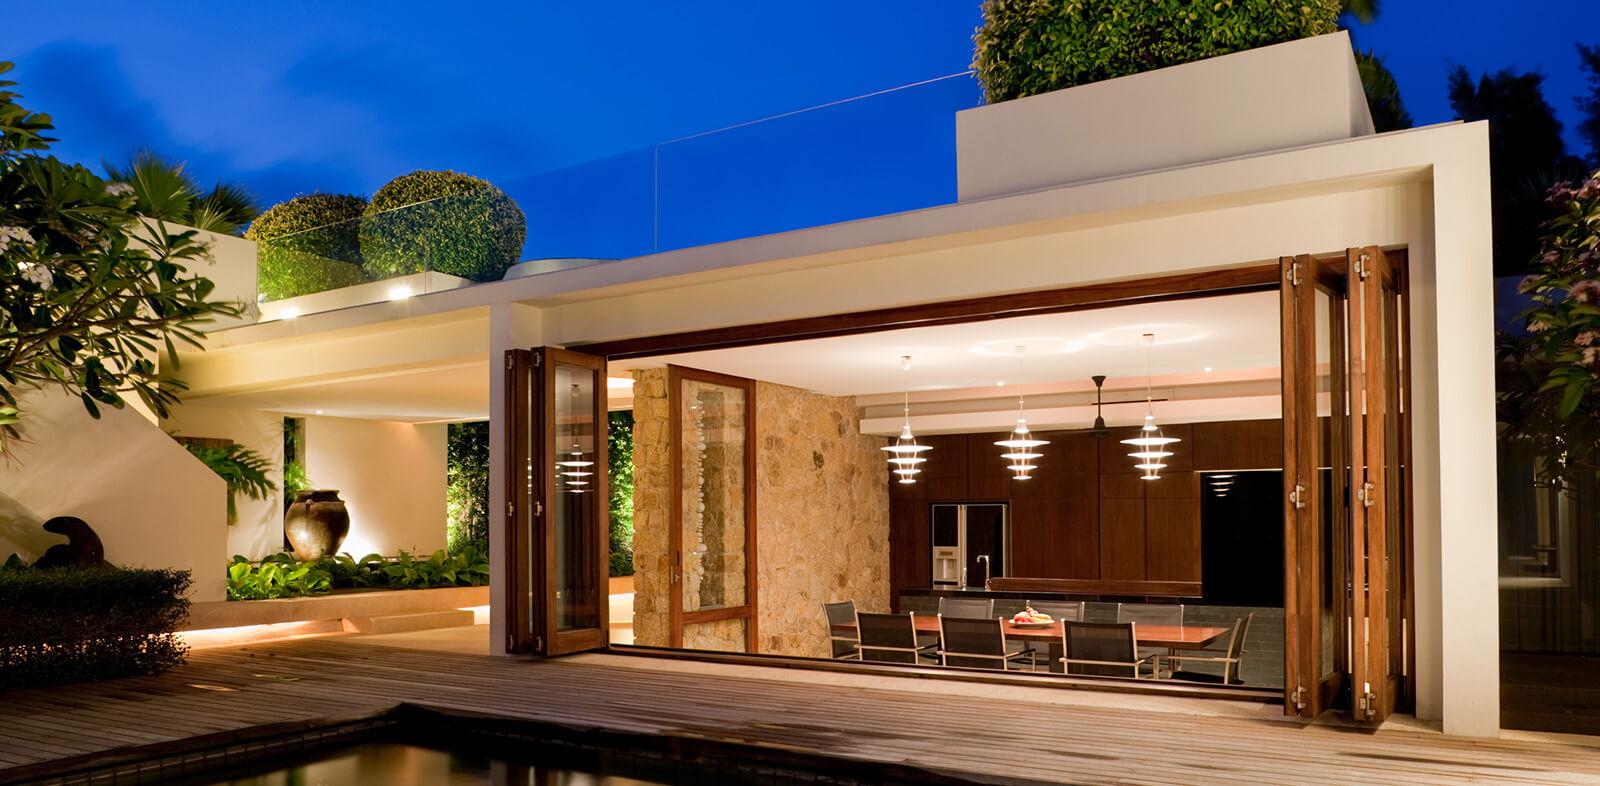 exterior design of luxury home in florida